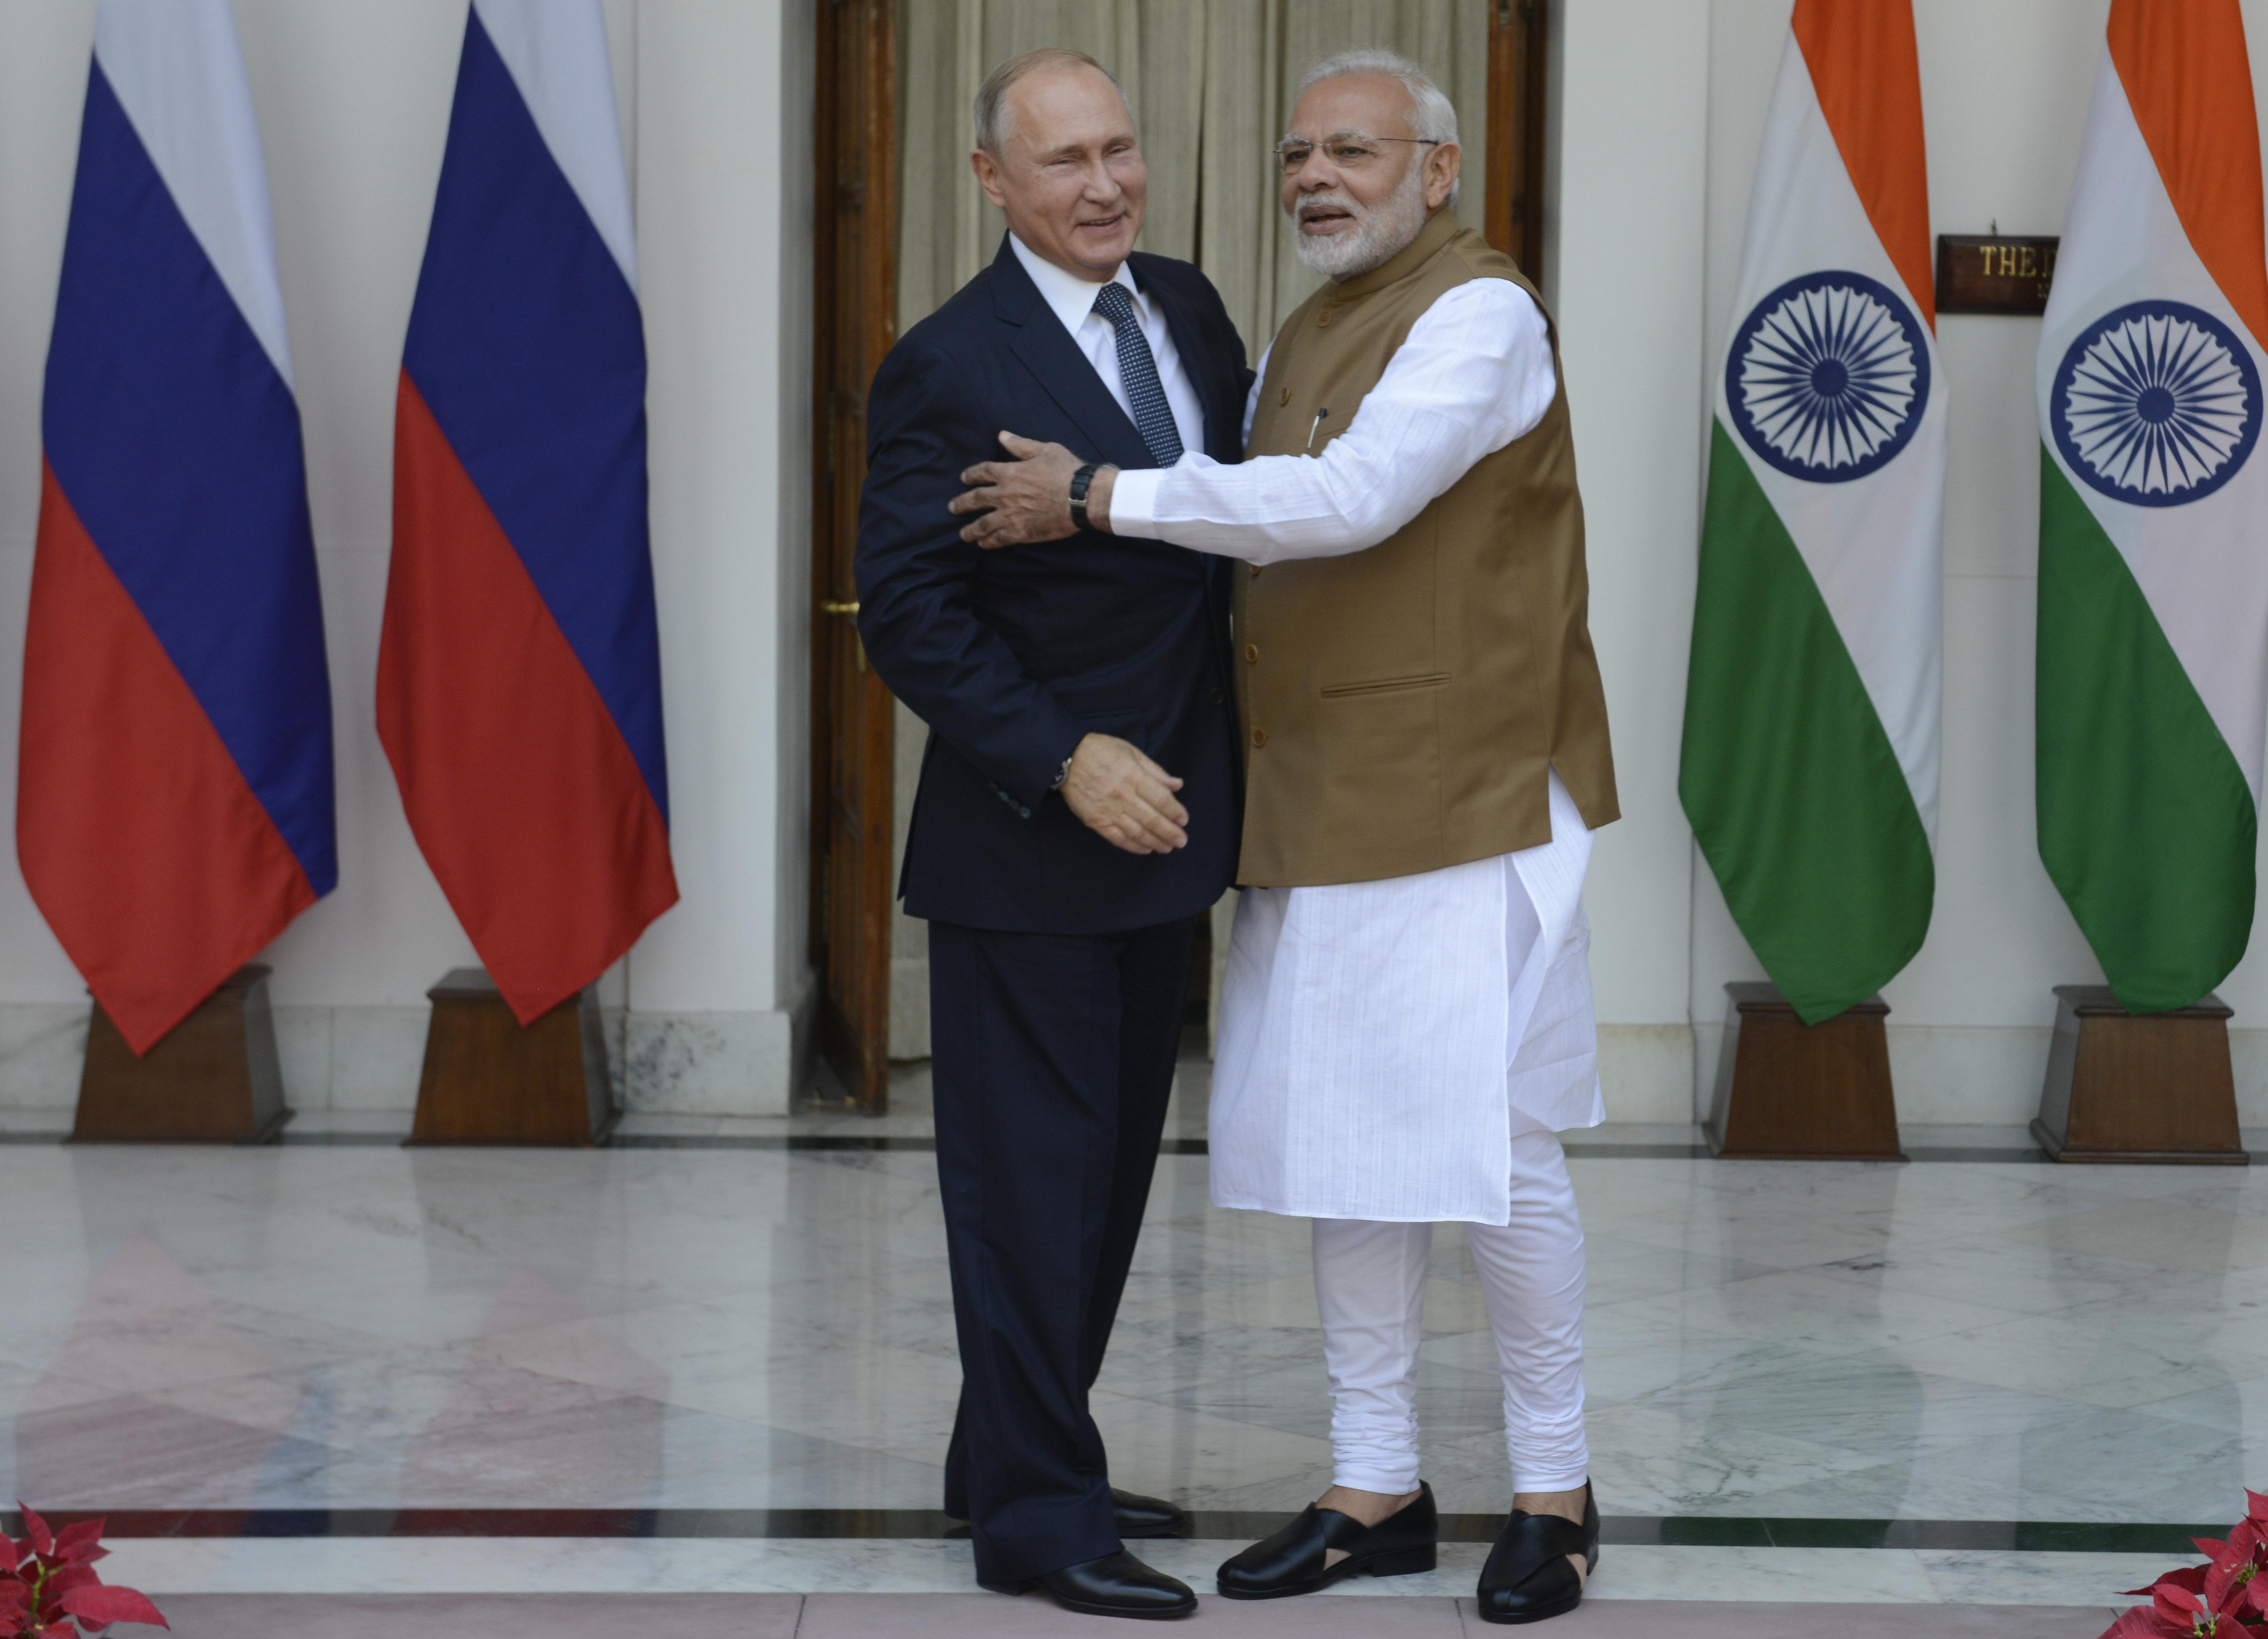 Russia Awards Modi Its Highest State